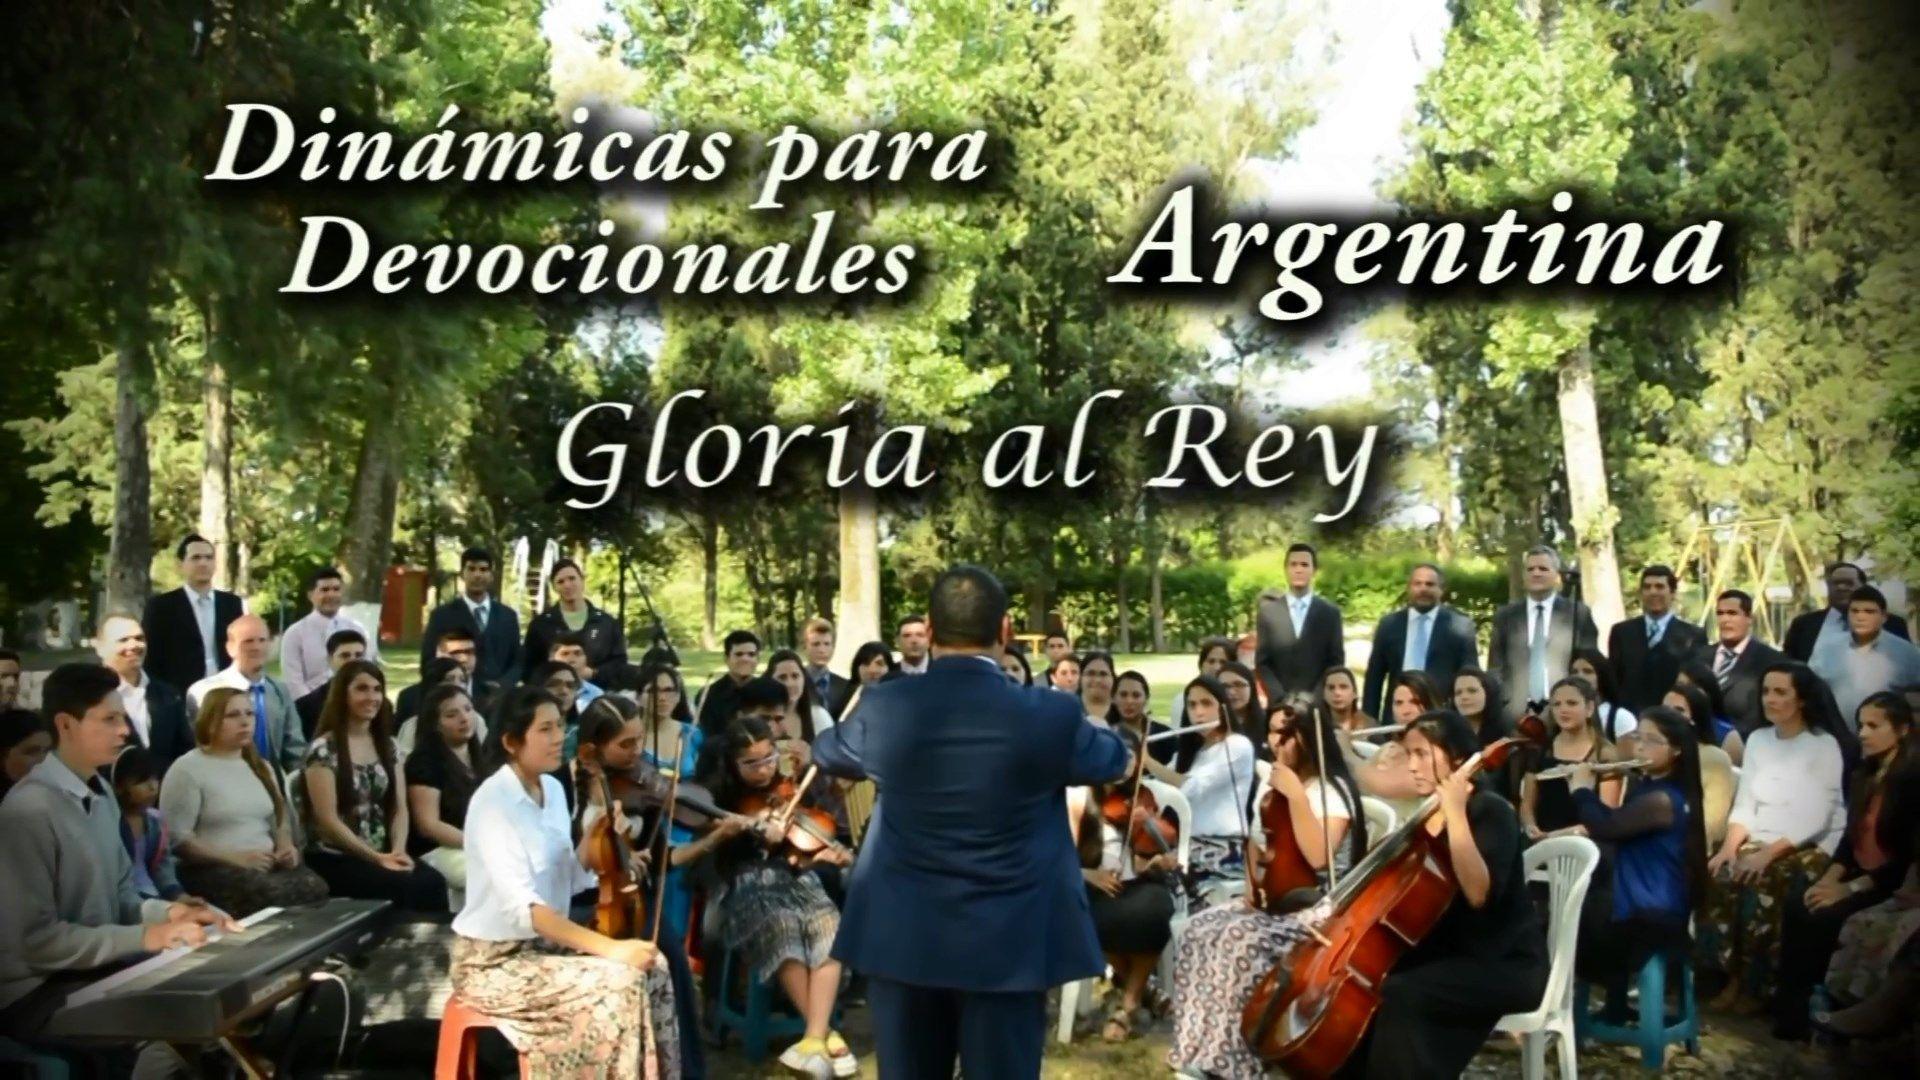 Gloria al Rey – Dinámicas para Devocionales – Argentina